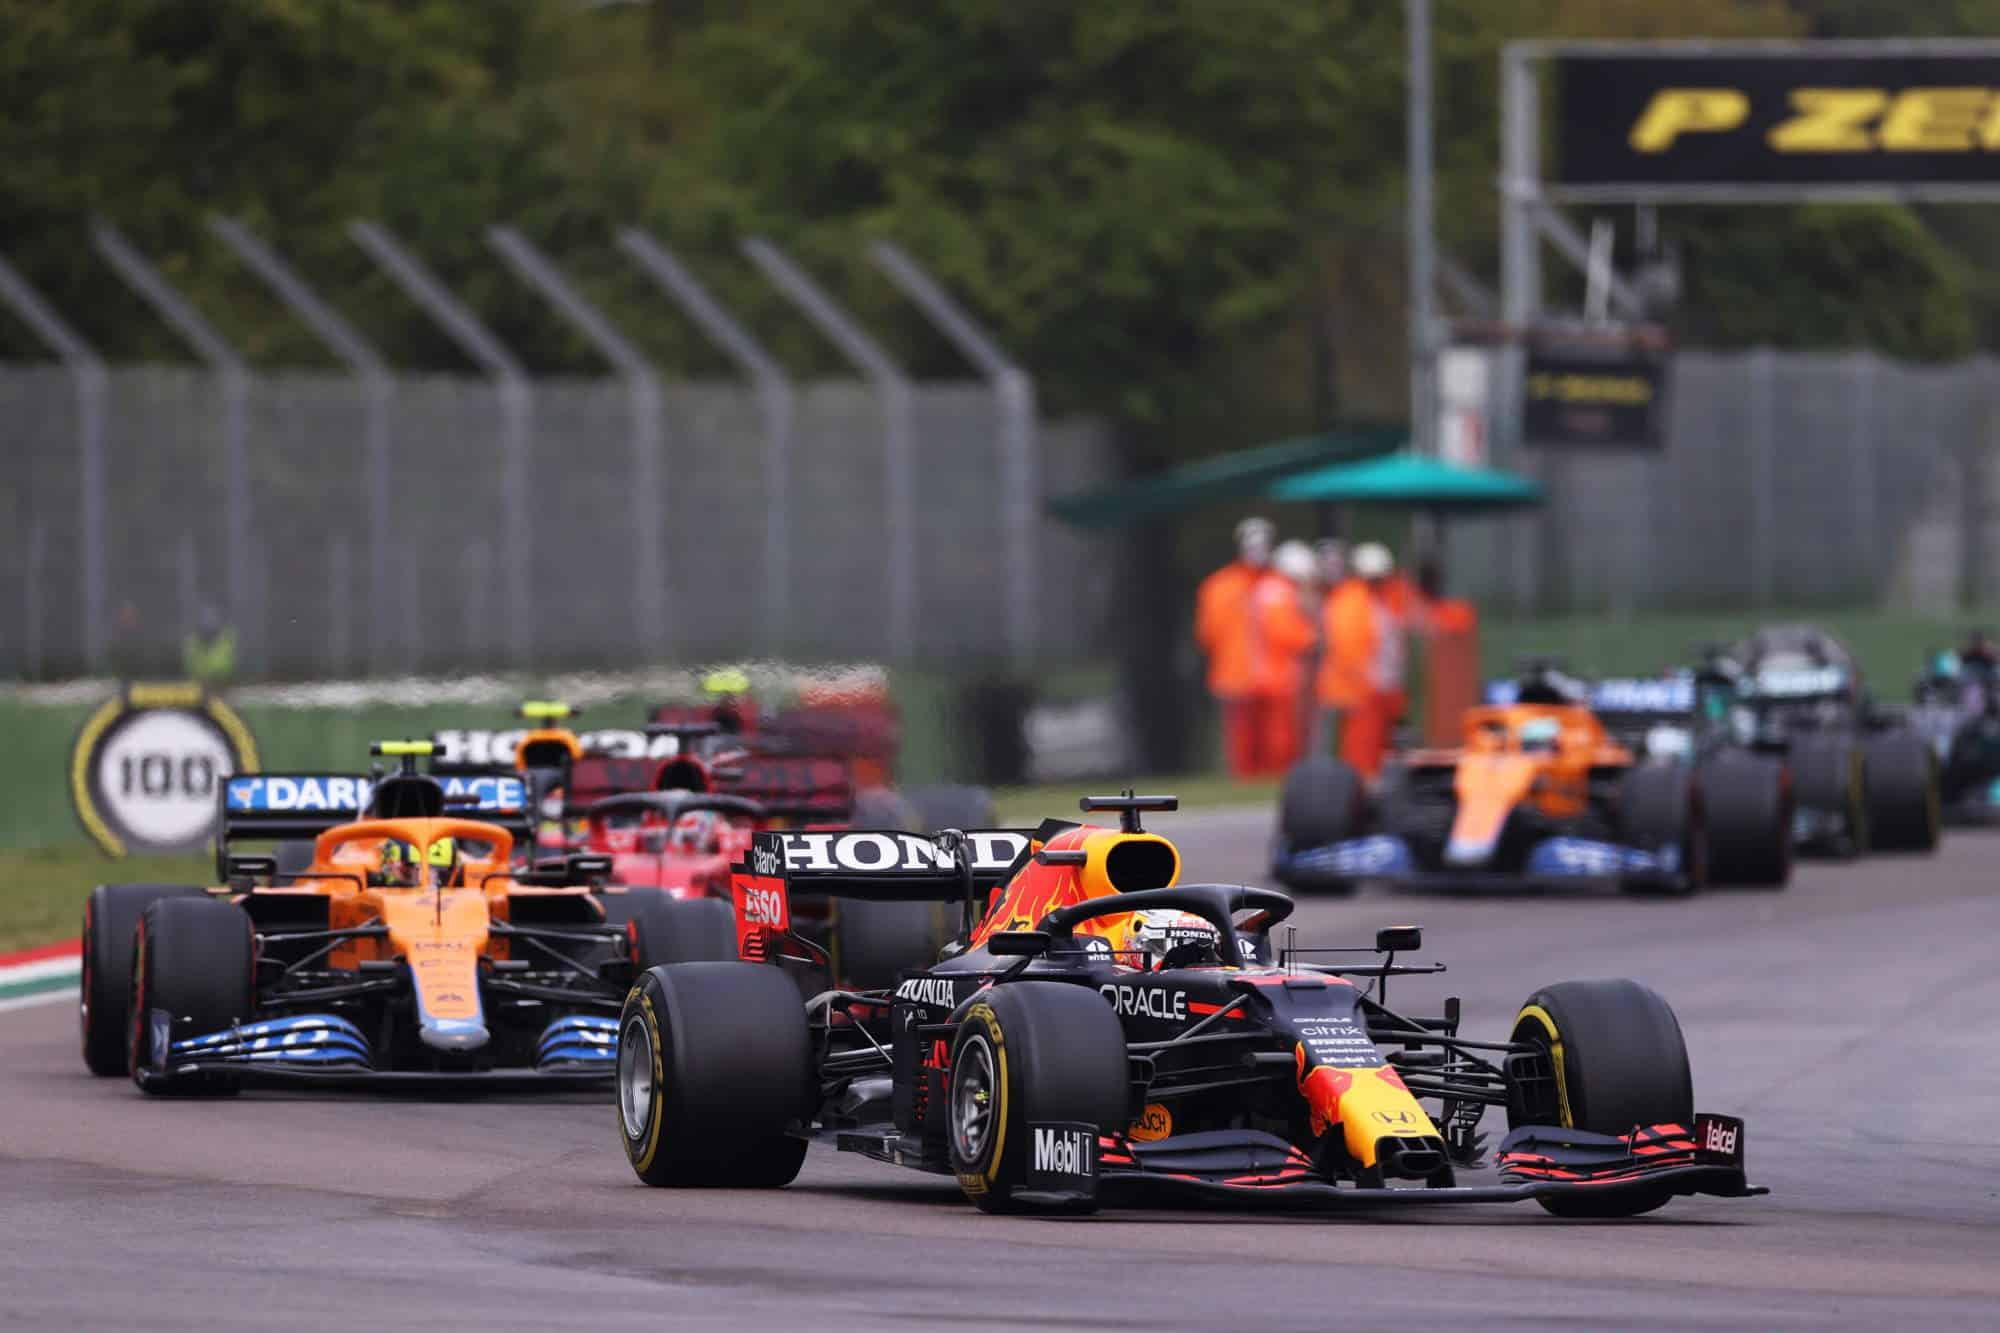 2021 Emilia Romagna GP Verstappen leads Norris after the restart red flag Photo Red Bull